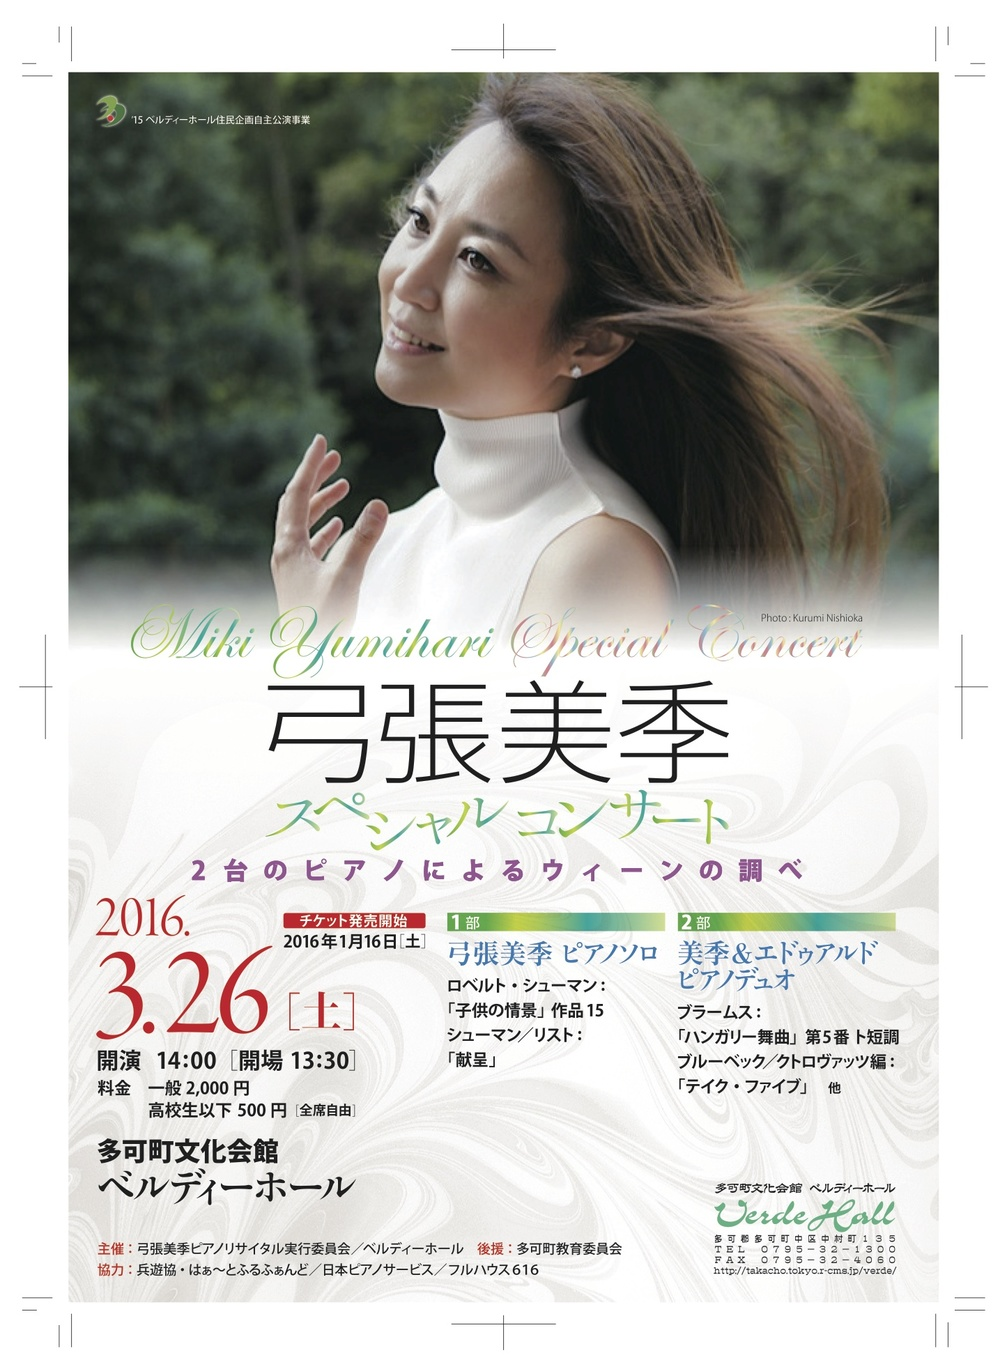 out_ok_yumihari_4c.jpg